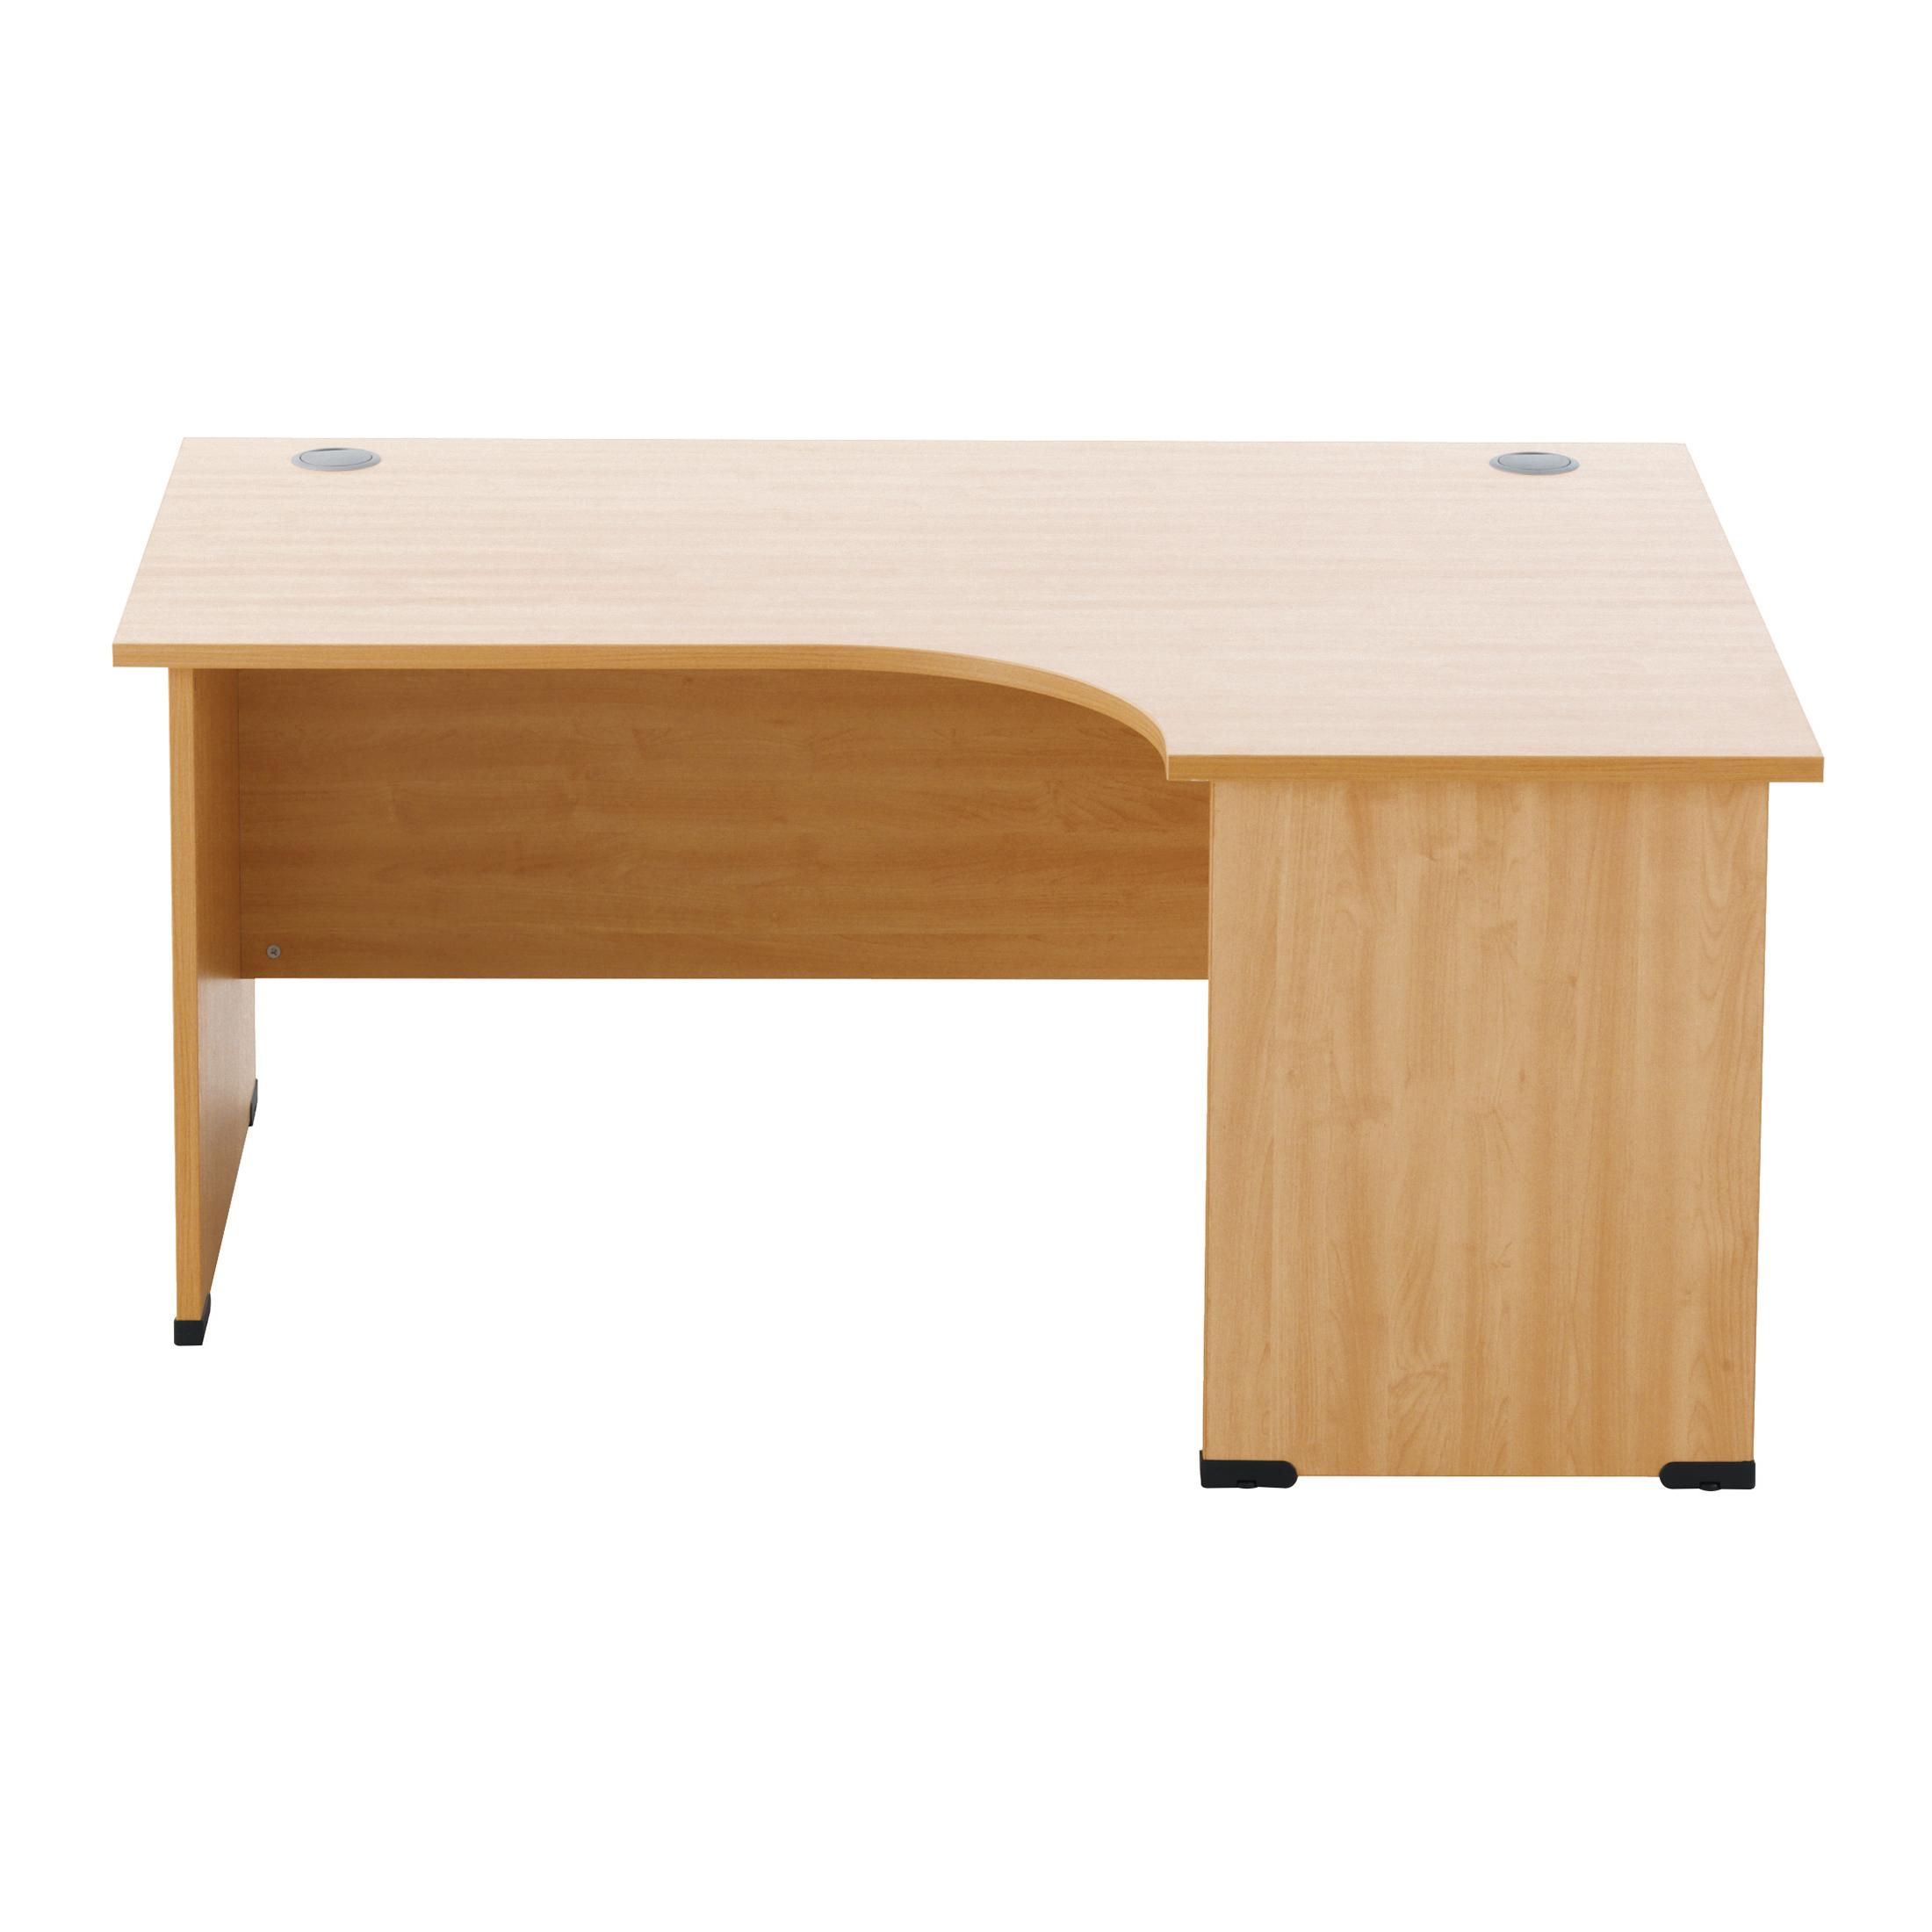 Desks Sonix Radial Desk Right Hand Panel End Legs 1600/1170mm Rich Beech Ref w9410rb